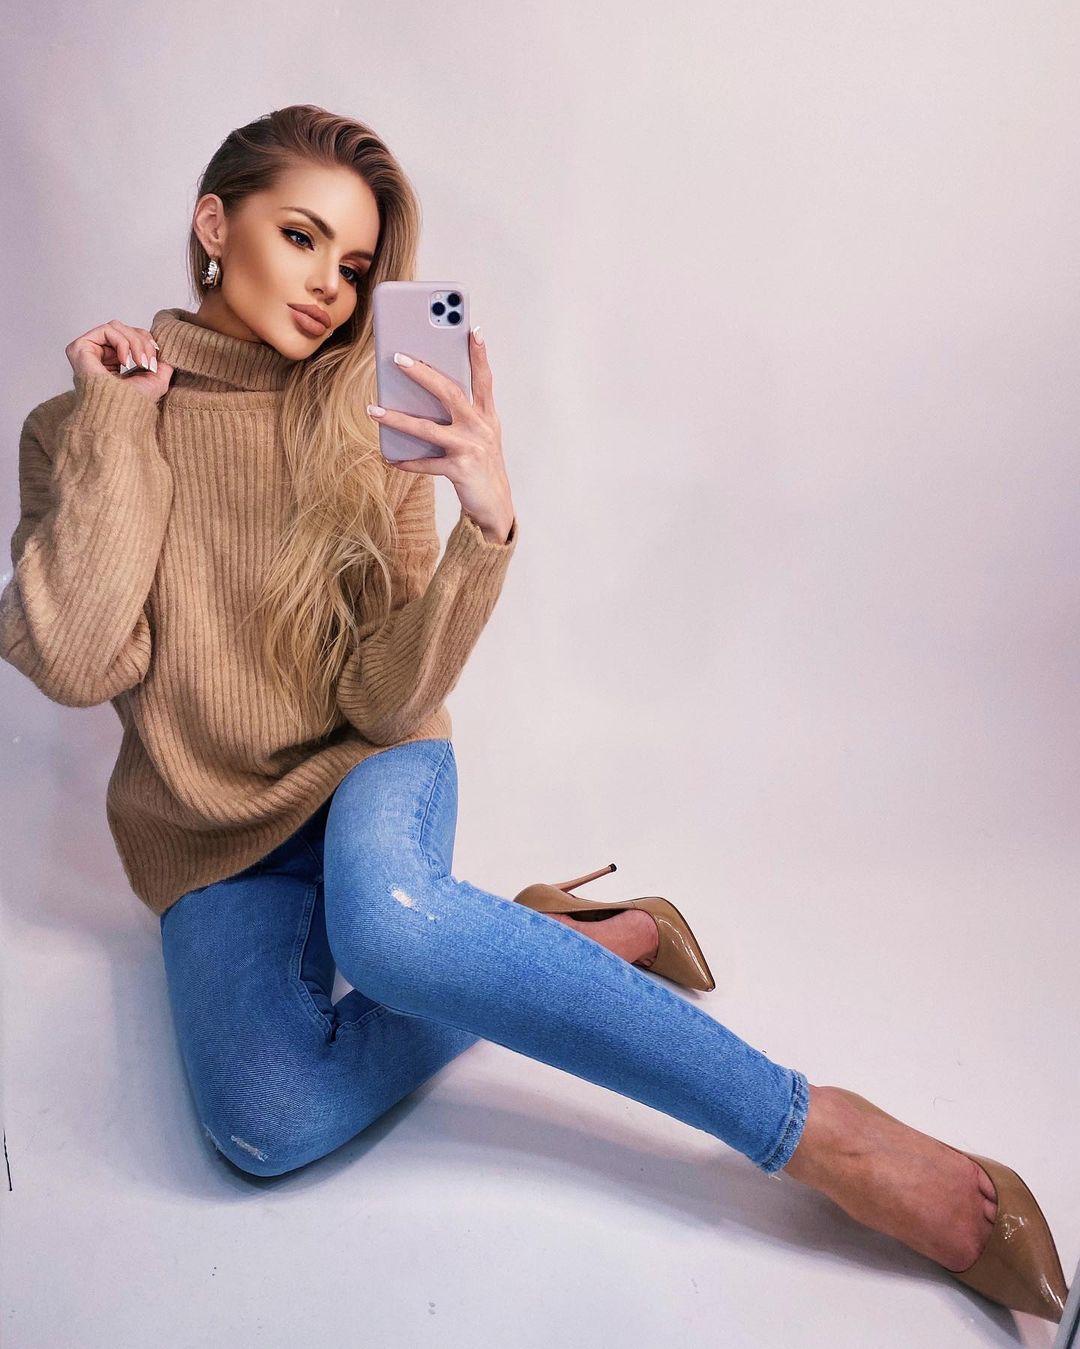 Alena-Vragevskaya-Wallpapers-Insta-Fit-Bio-11